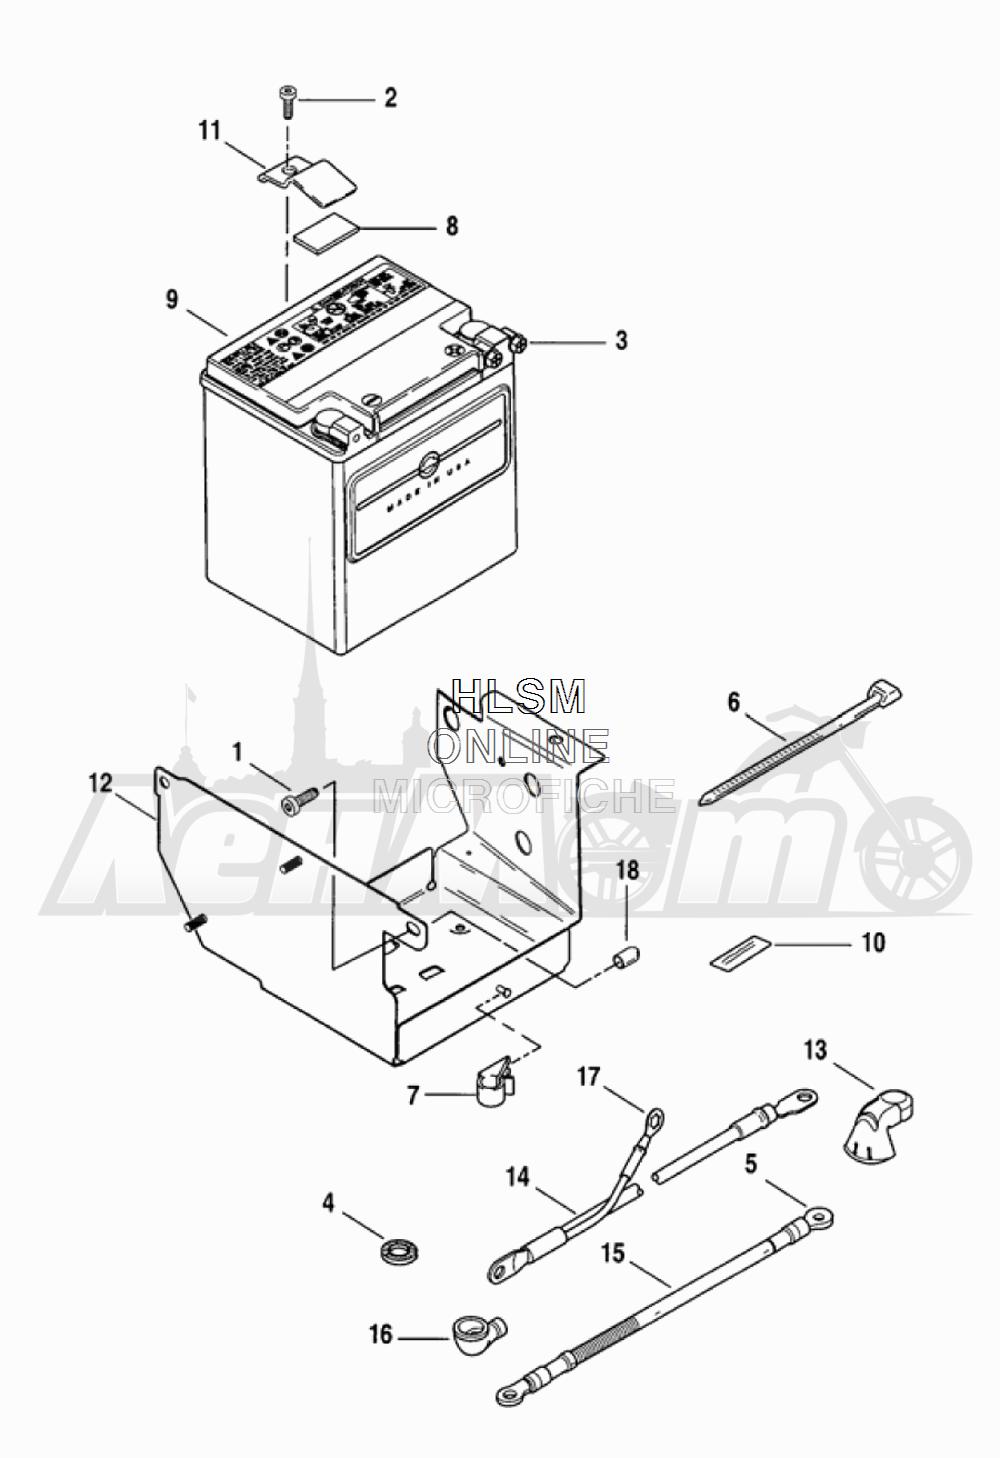 Запчасти для Мотоцикла Harley-Davidson 2005 FLTRI ROAD GLIDE® (INJECTION) (FS) Раздел: ELECTRICAL - BATTERY W/ BATTERY TRAY ASSEMBLY   электрика аккумулятор вместе с аккумулятор лоток в сборе